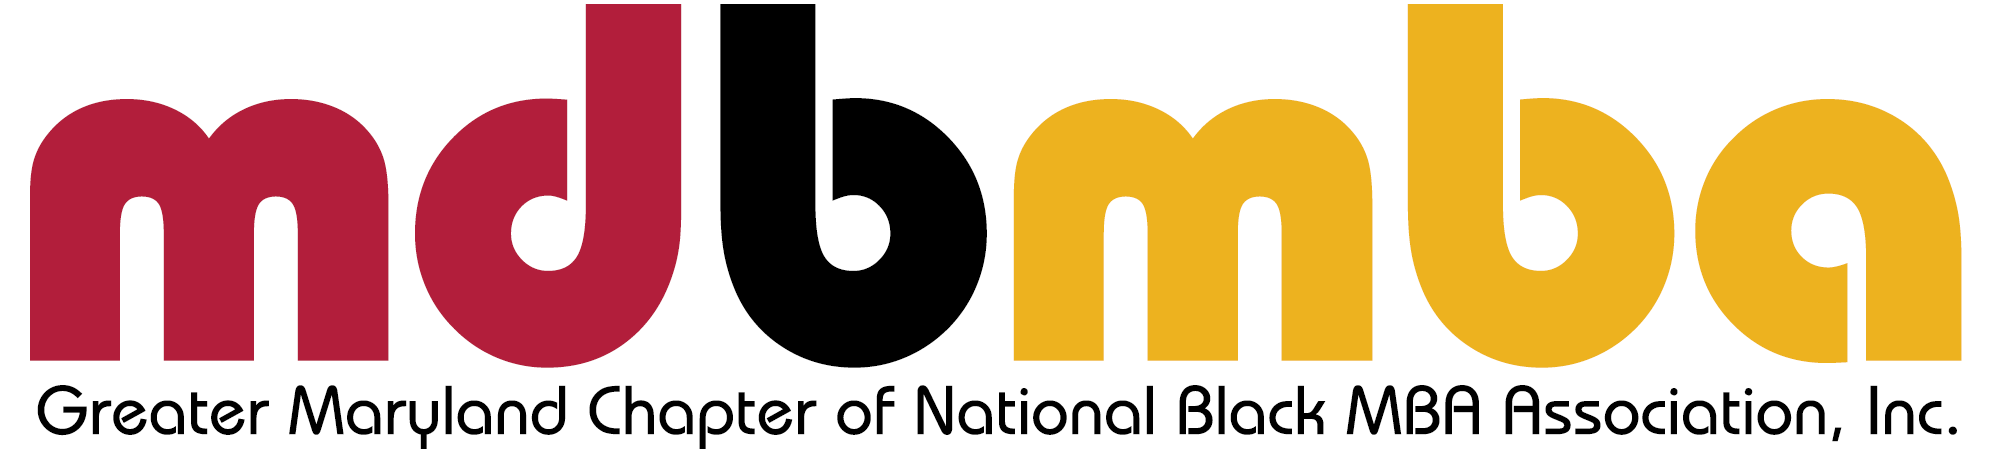 Greater Maryland Black MBA Association